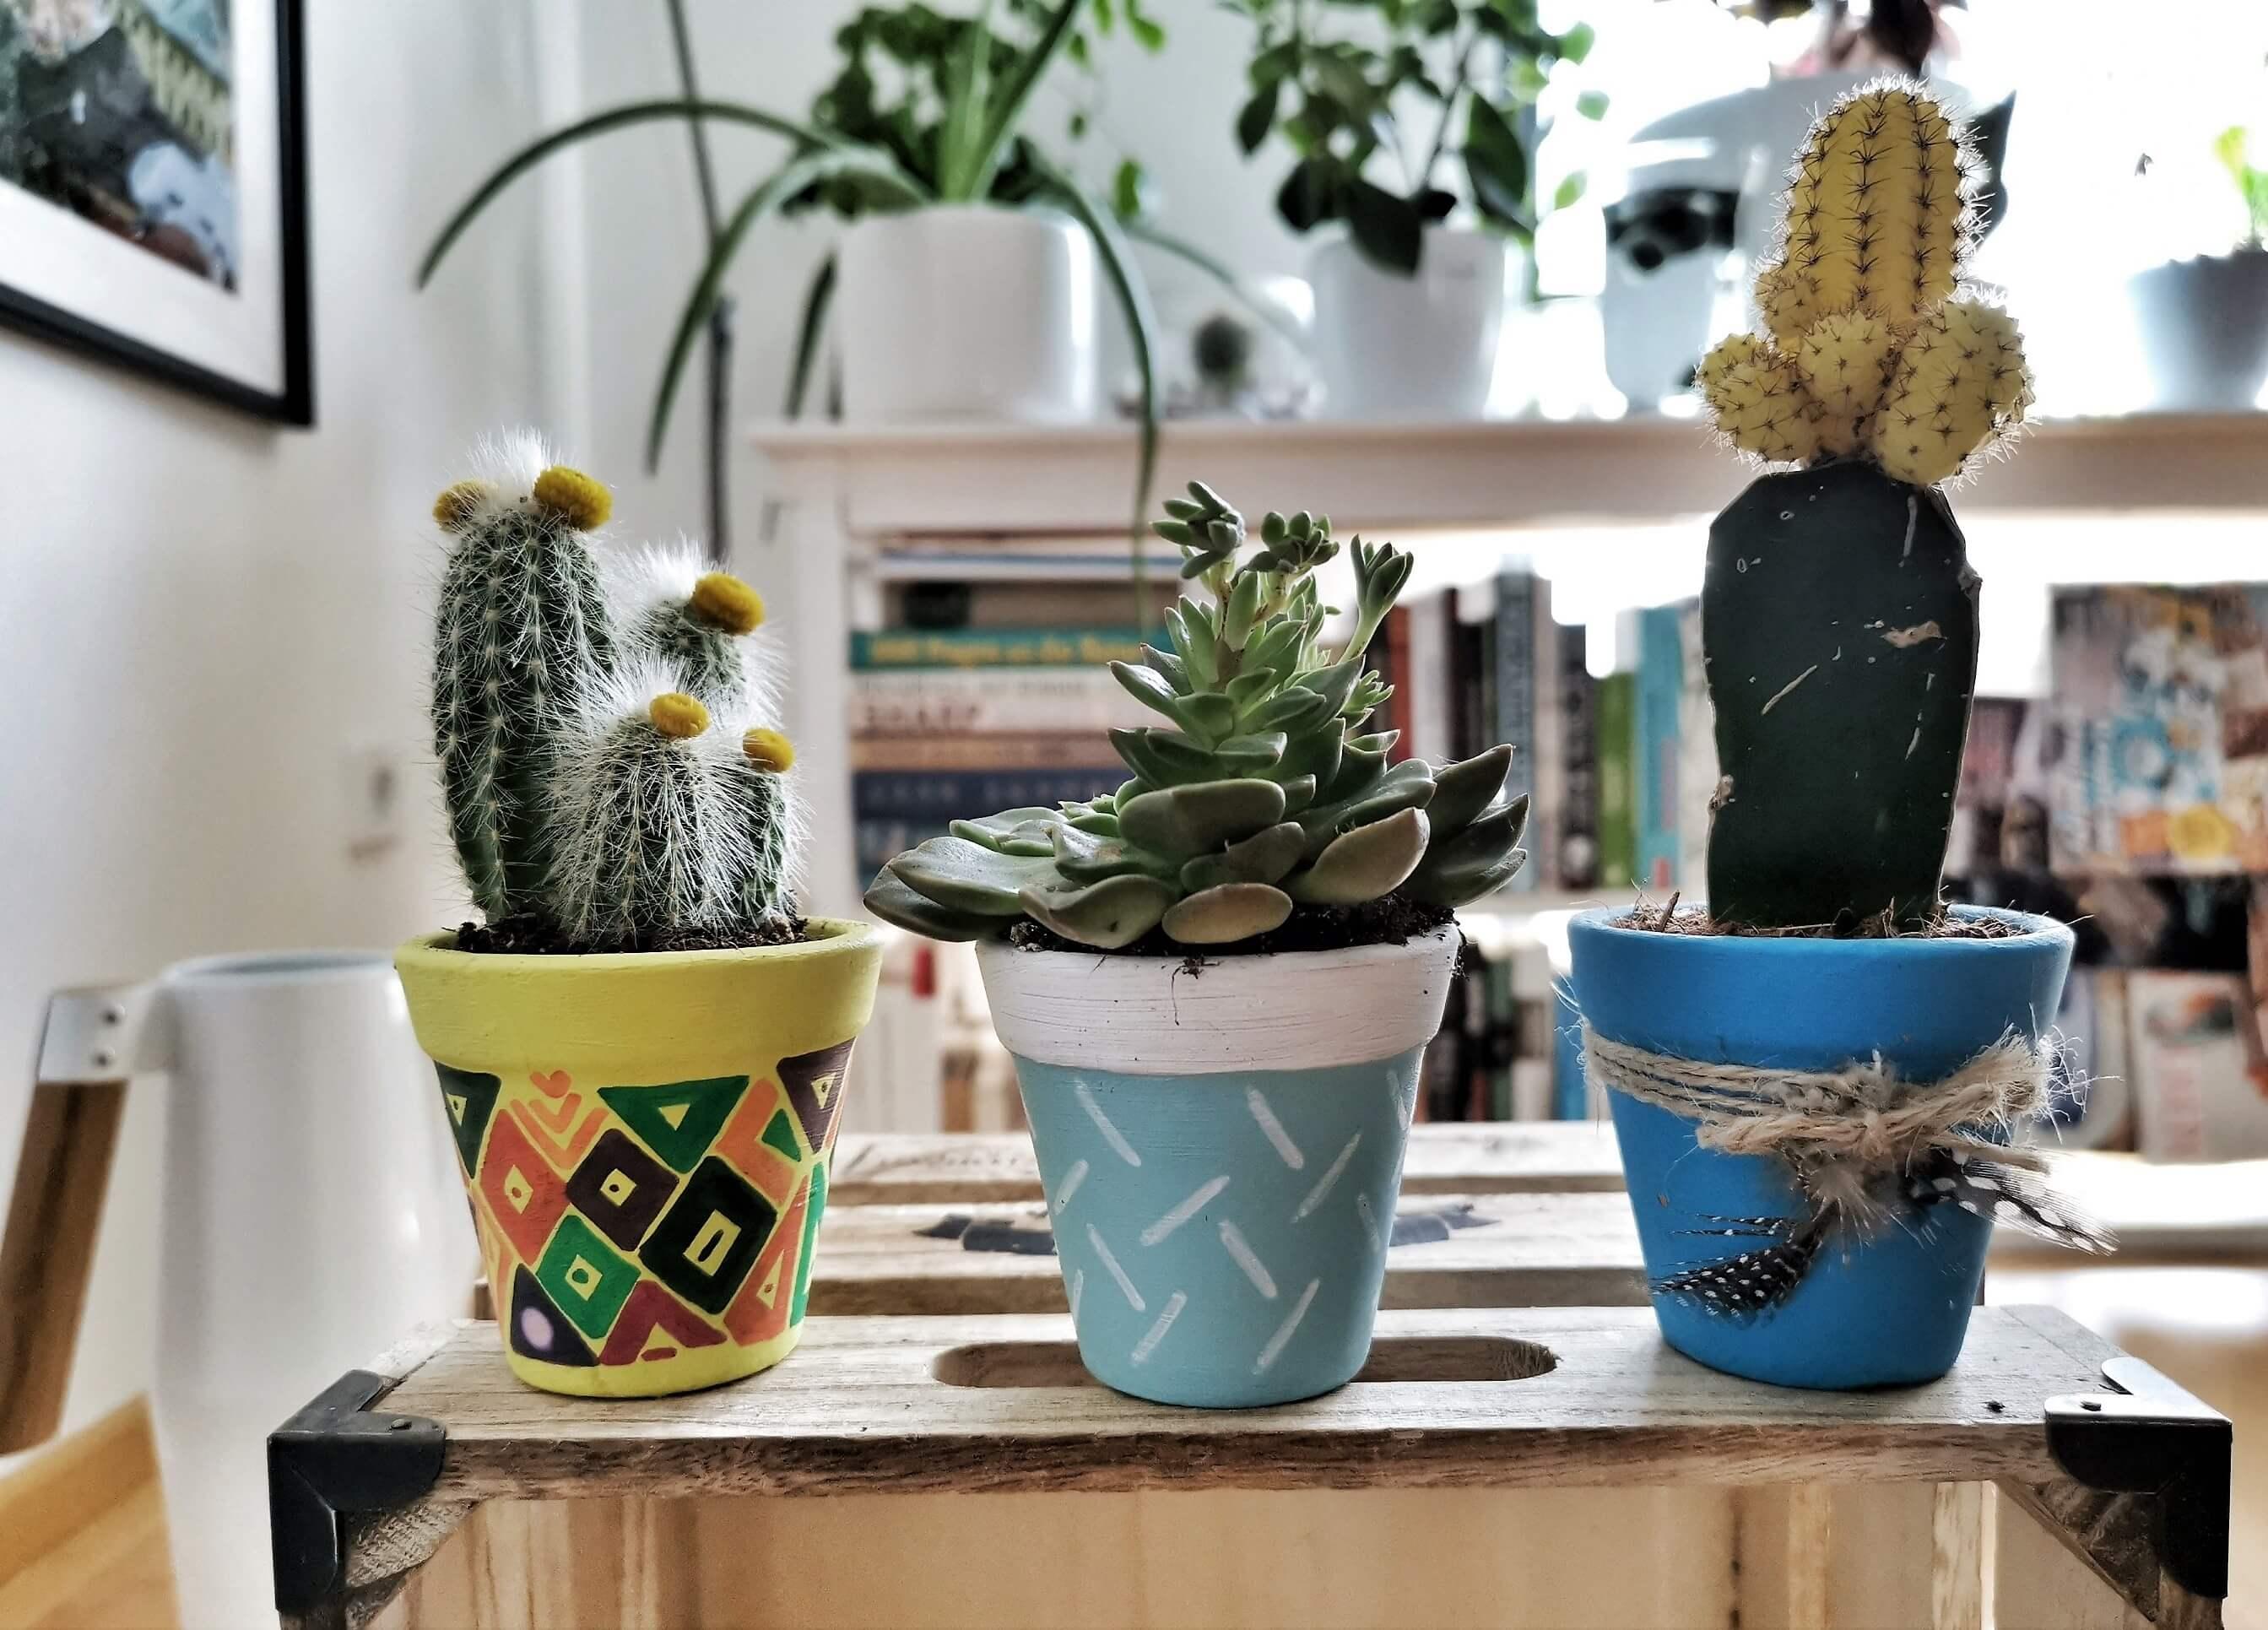 IMG 20190612 130740 01 resized 20190612 070653418 - Kreatives Recycling: Blumentöpfe in 5 verschiedenen Stilen